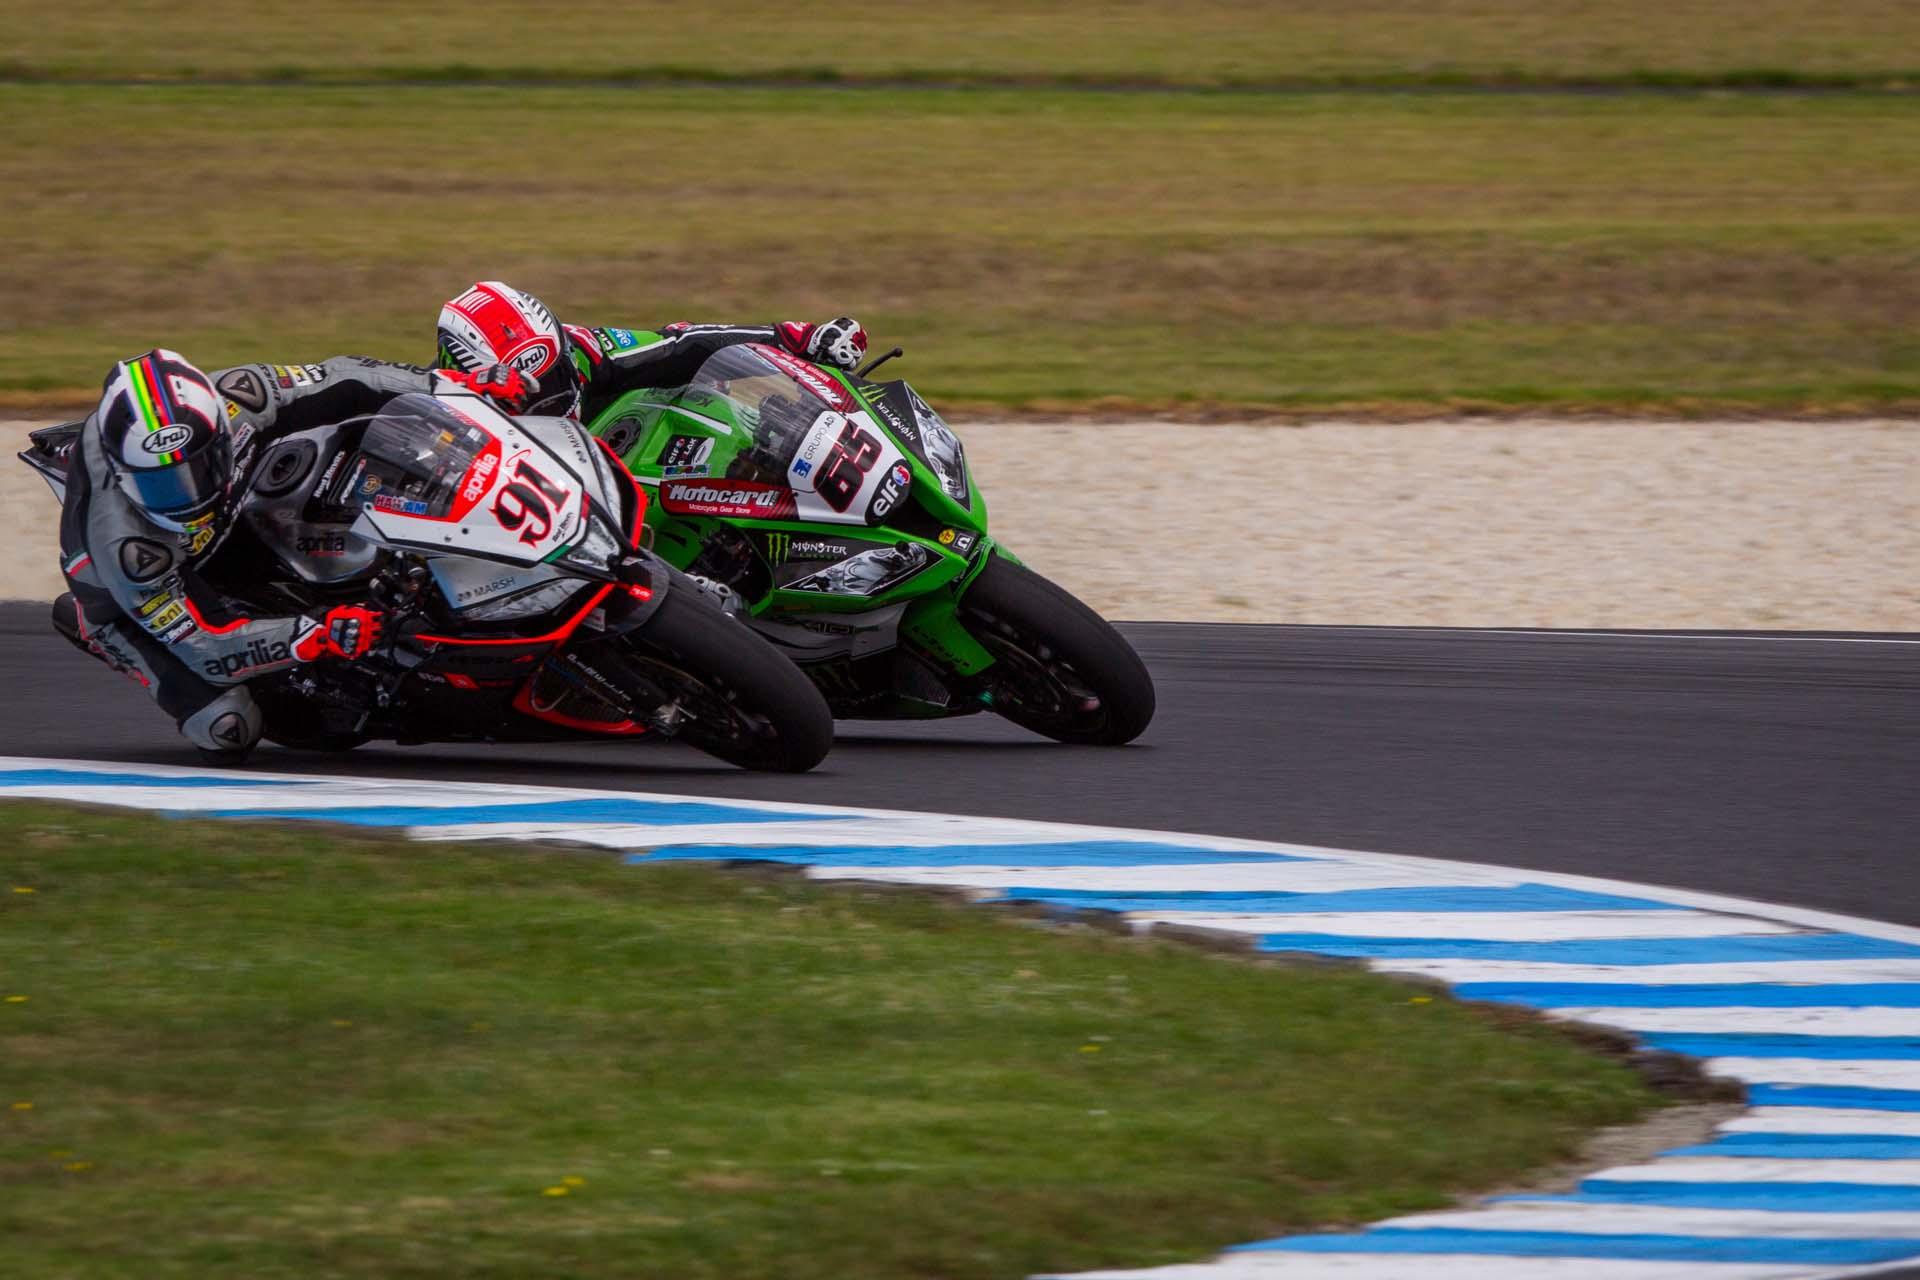 [WSBK] Phillip Island 2015-World-Superbike-Phillip-Island-Anant-Deboor-08